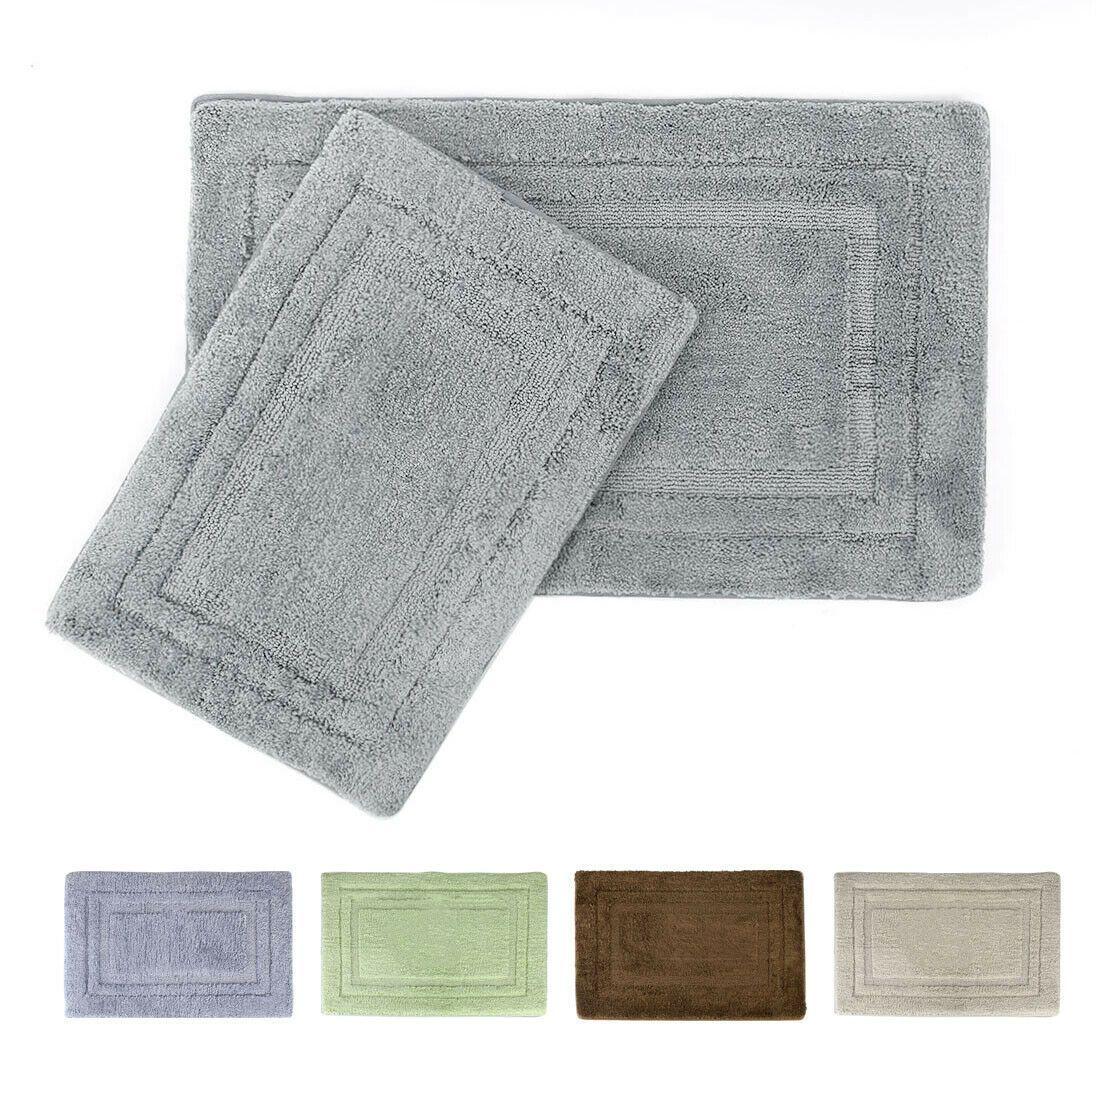 Bathroom Mat Memory Cotton Bath Kitchen Mat Pad Carpet Rug Doormat 2 In 1 30 21 Bathroom Rugs Ideas Of Bathroo In 2020 Bathroom Mats Rugs On Carpet Bathroom Rugs